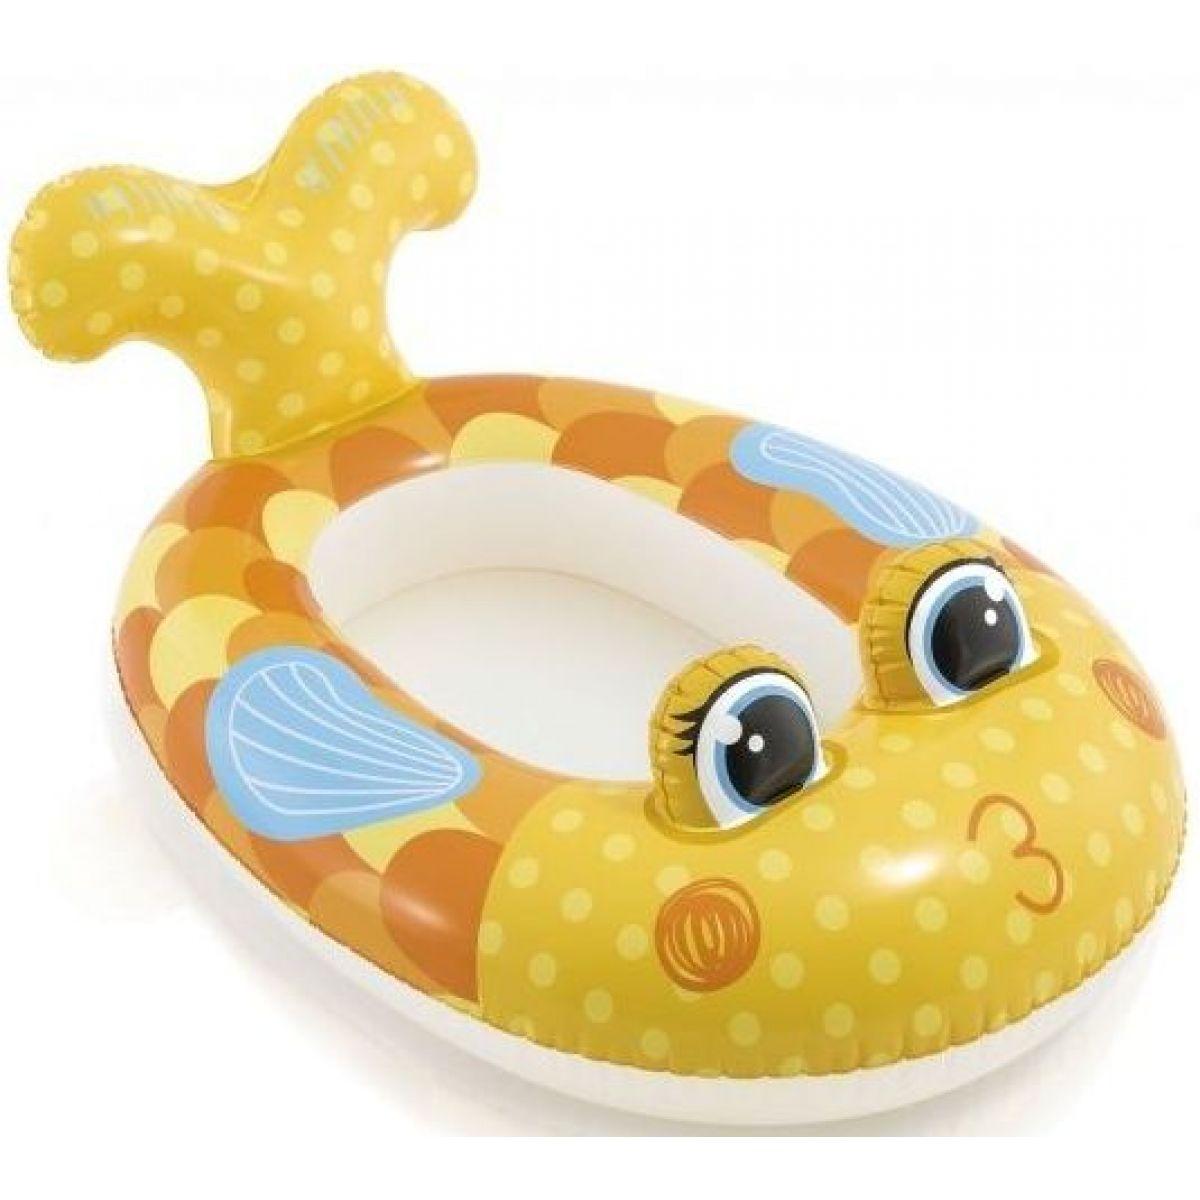 Čln detský Intex 59380 - Ryba